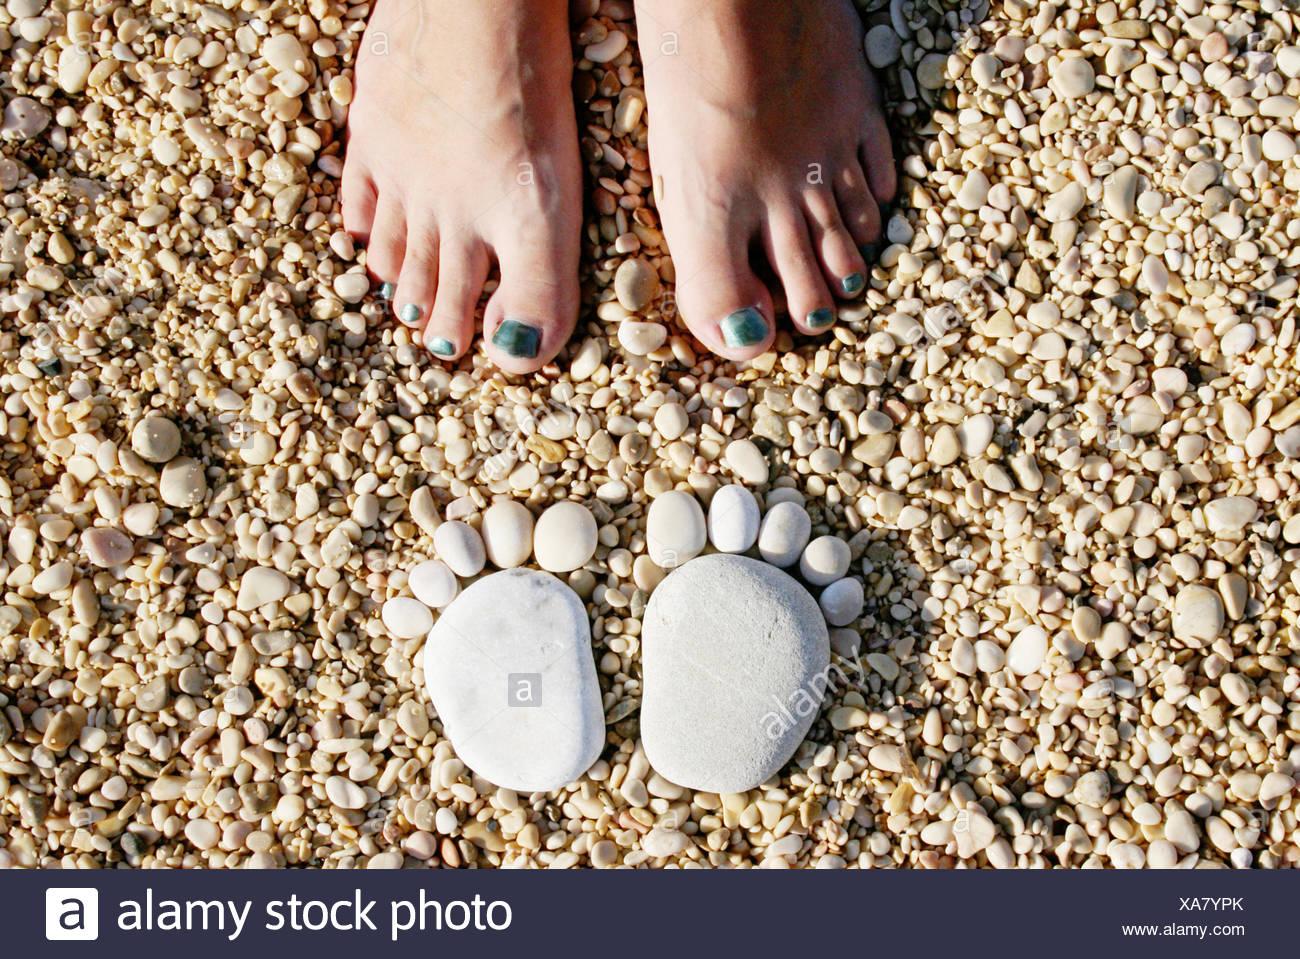 La Croatie, pierres en forme de pieds en avant des pieds de femme Photo Stock